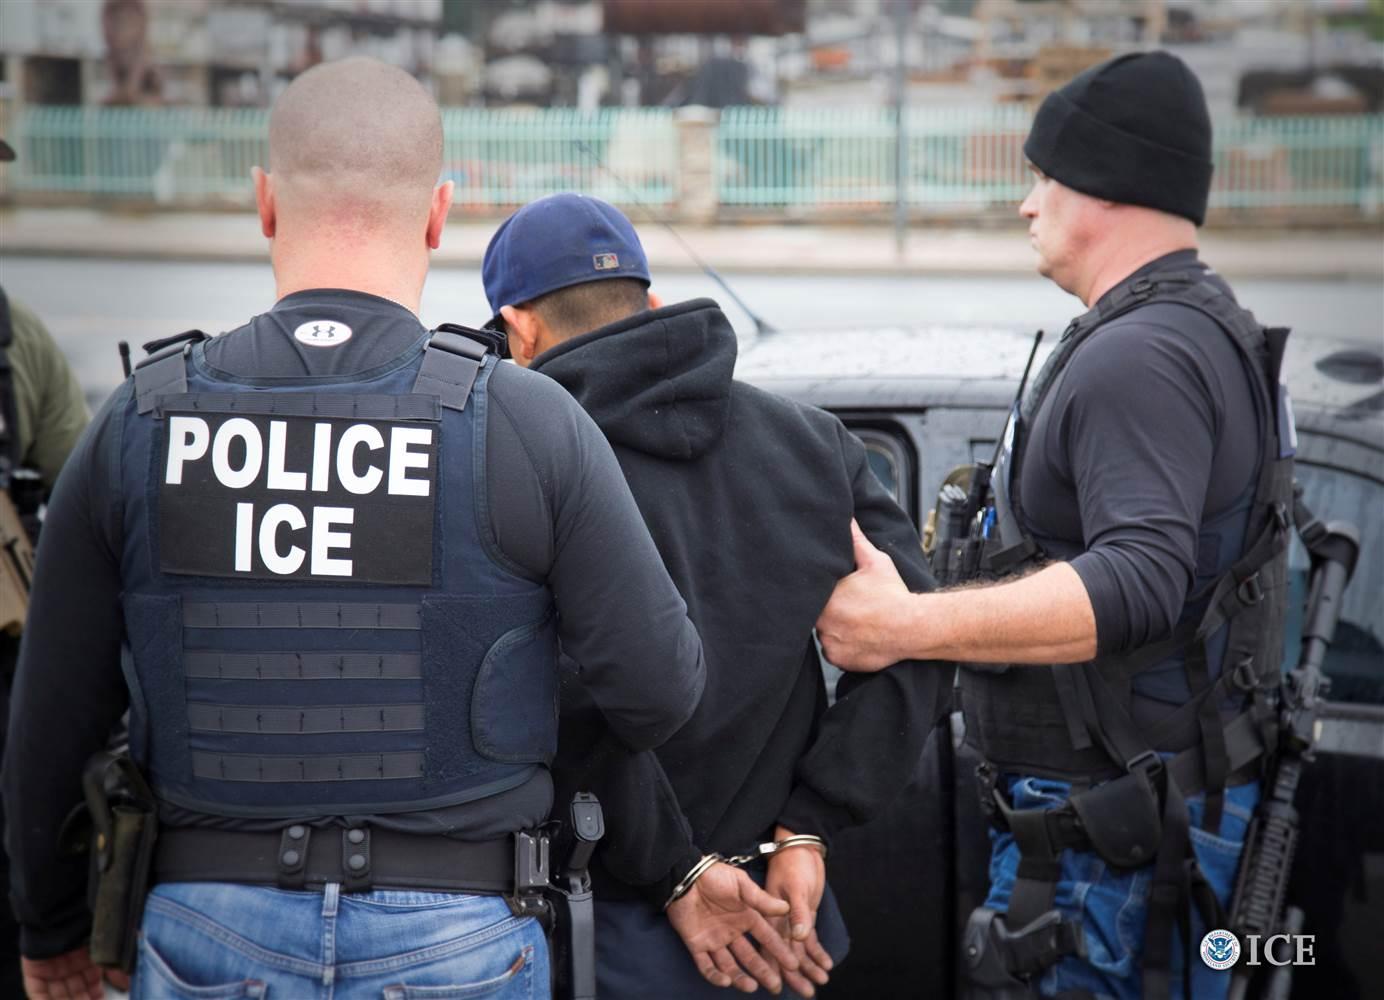 ICE Arrests 89 Criminal Illegal Immigrants in TexasOklahoma Sweep